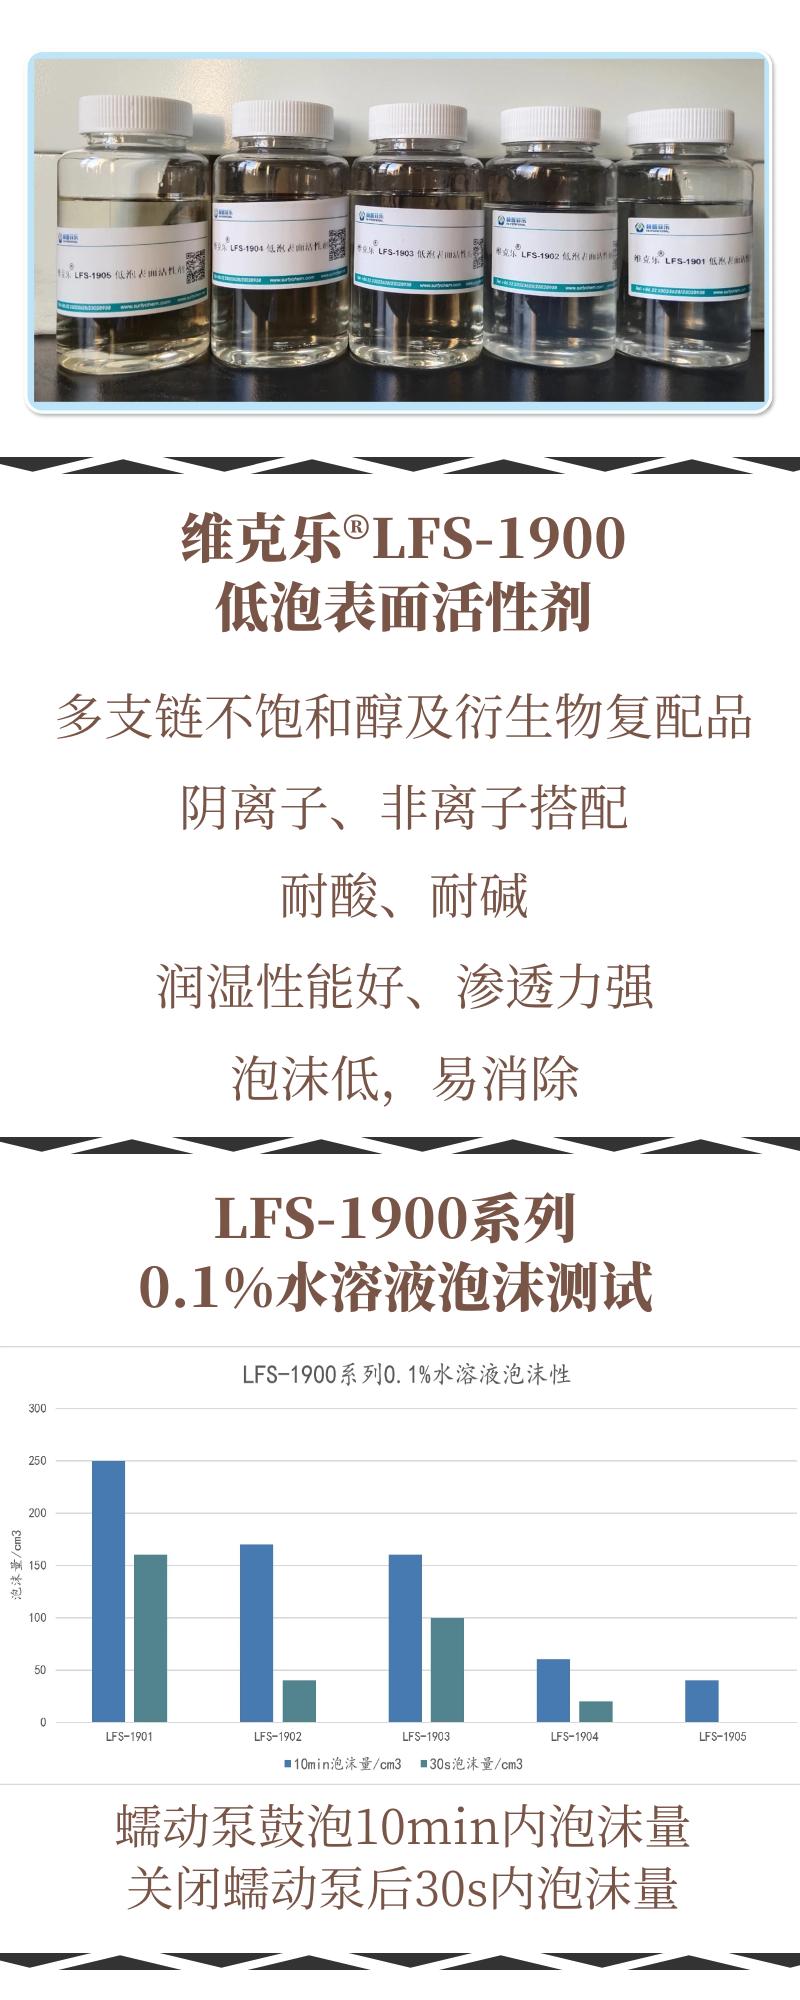 LFS-1900產品介紹1.png